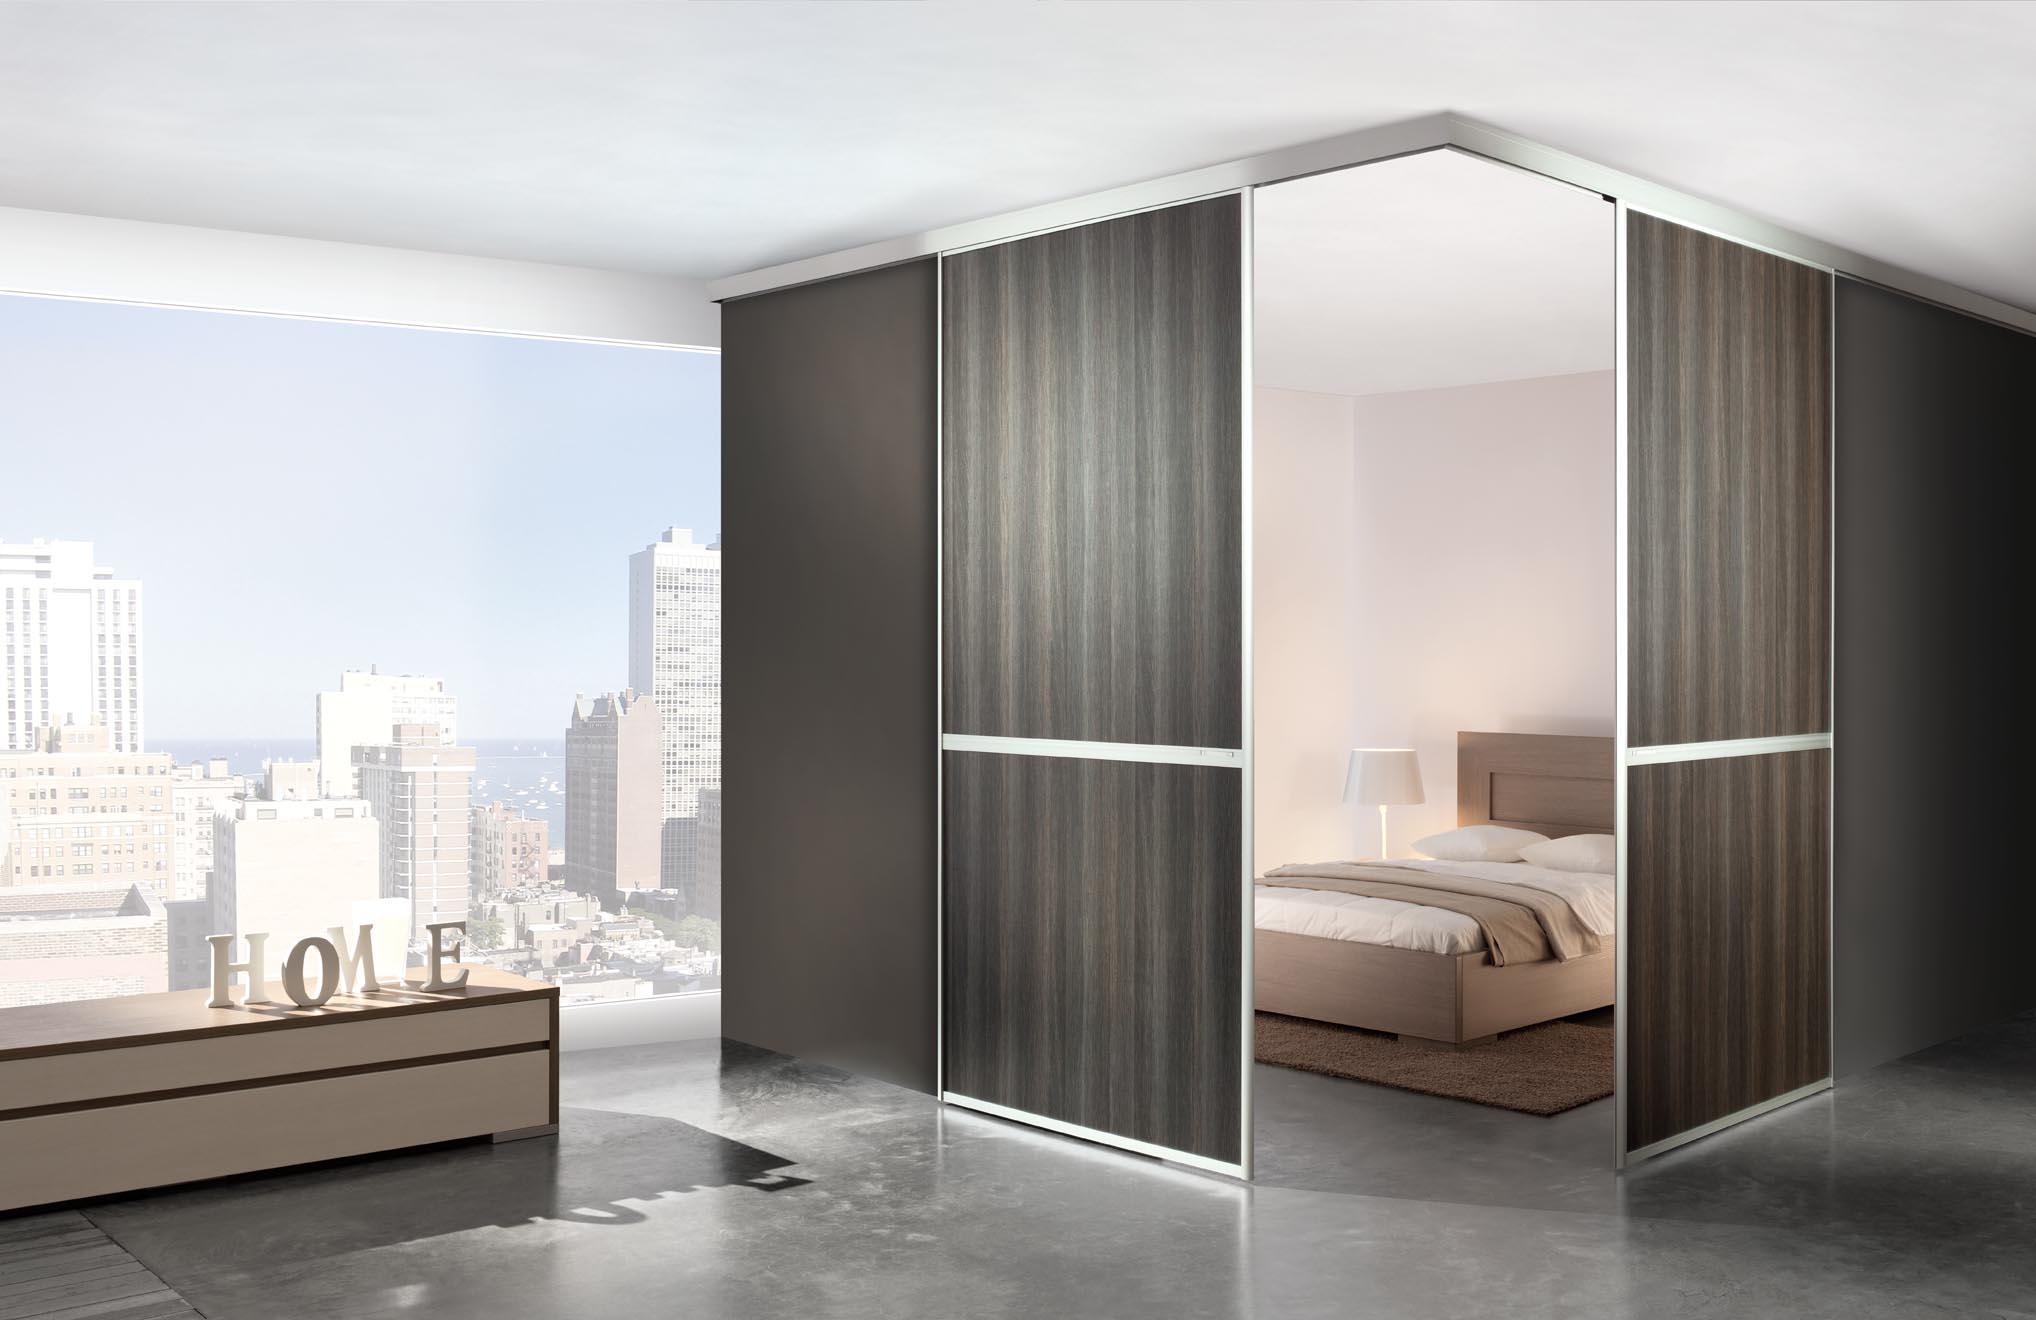 tol ajt megold sok komandor. Black Bedroom Furniture Sets. Home Design Ideas